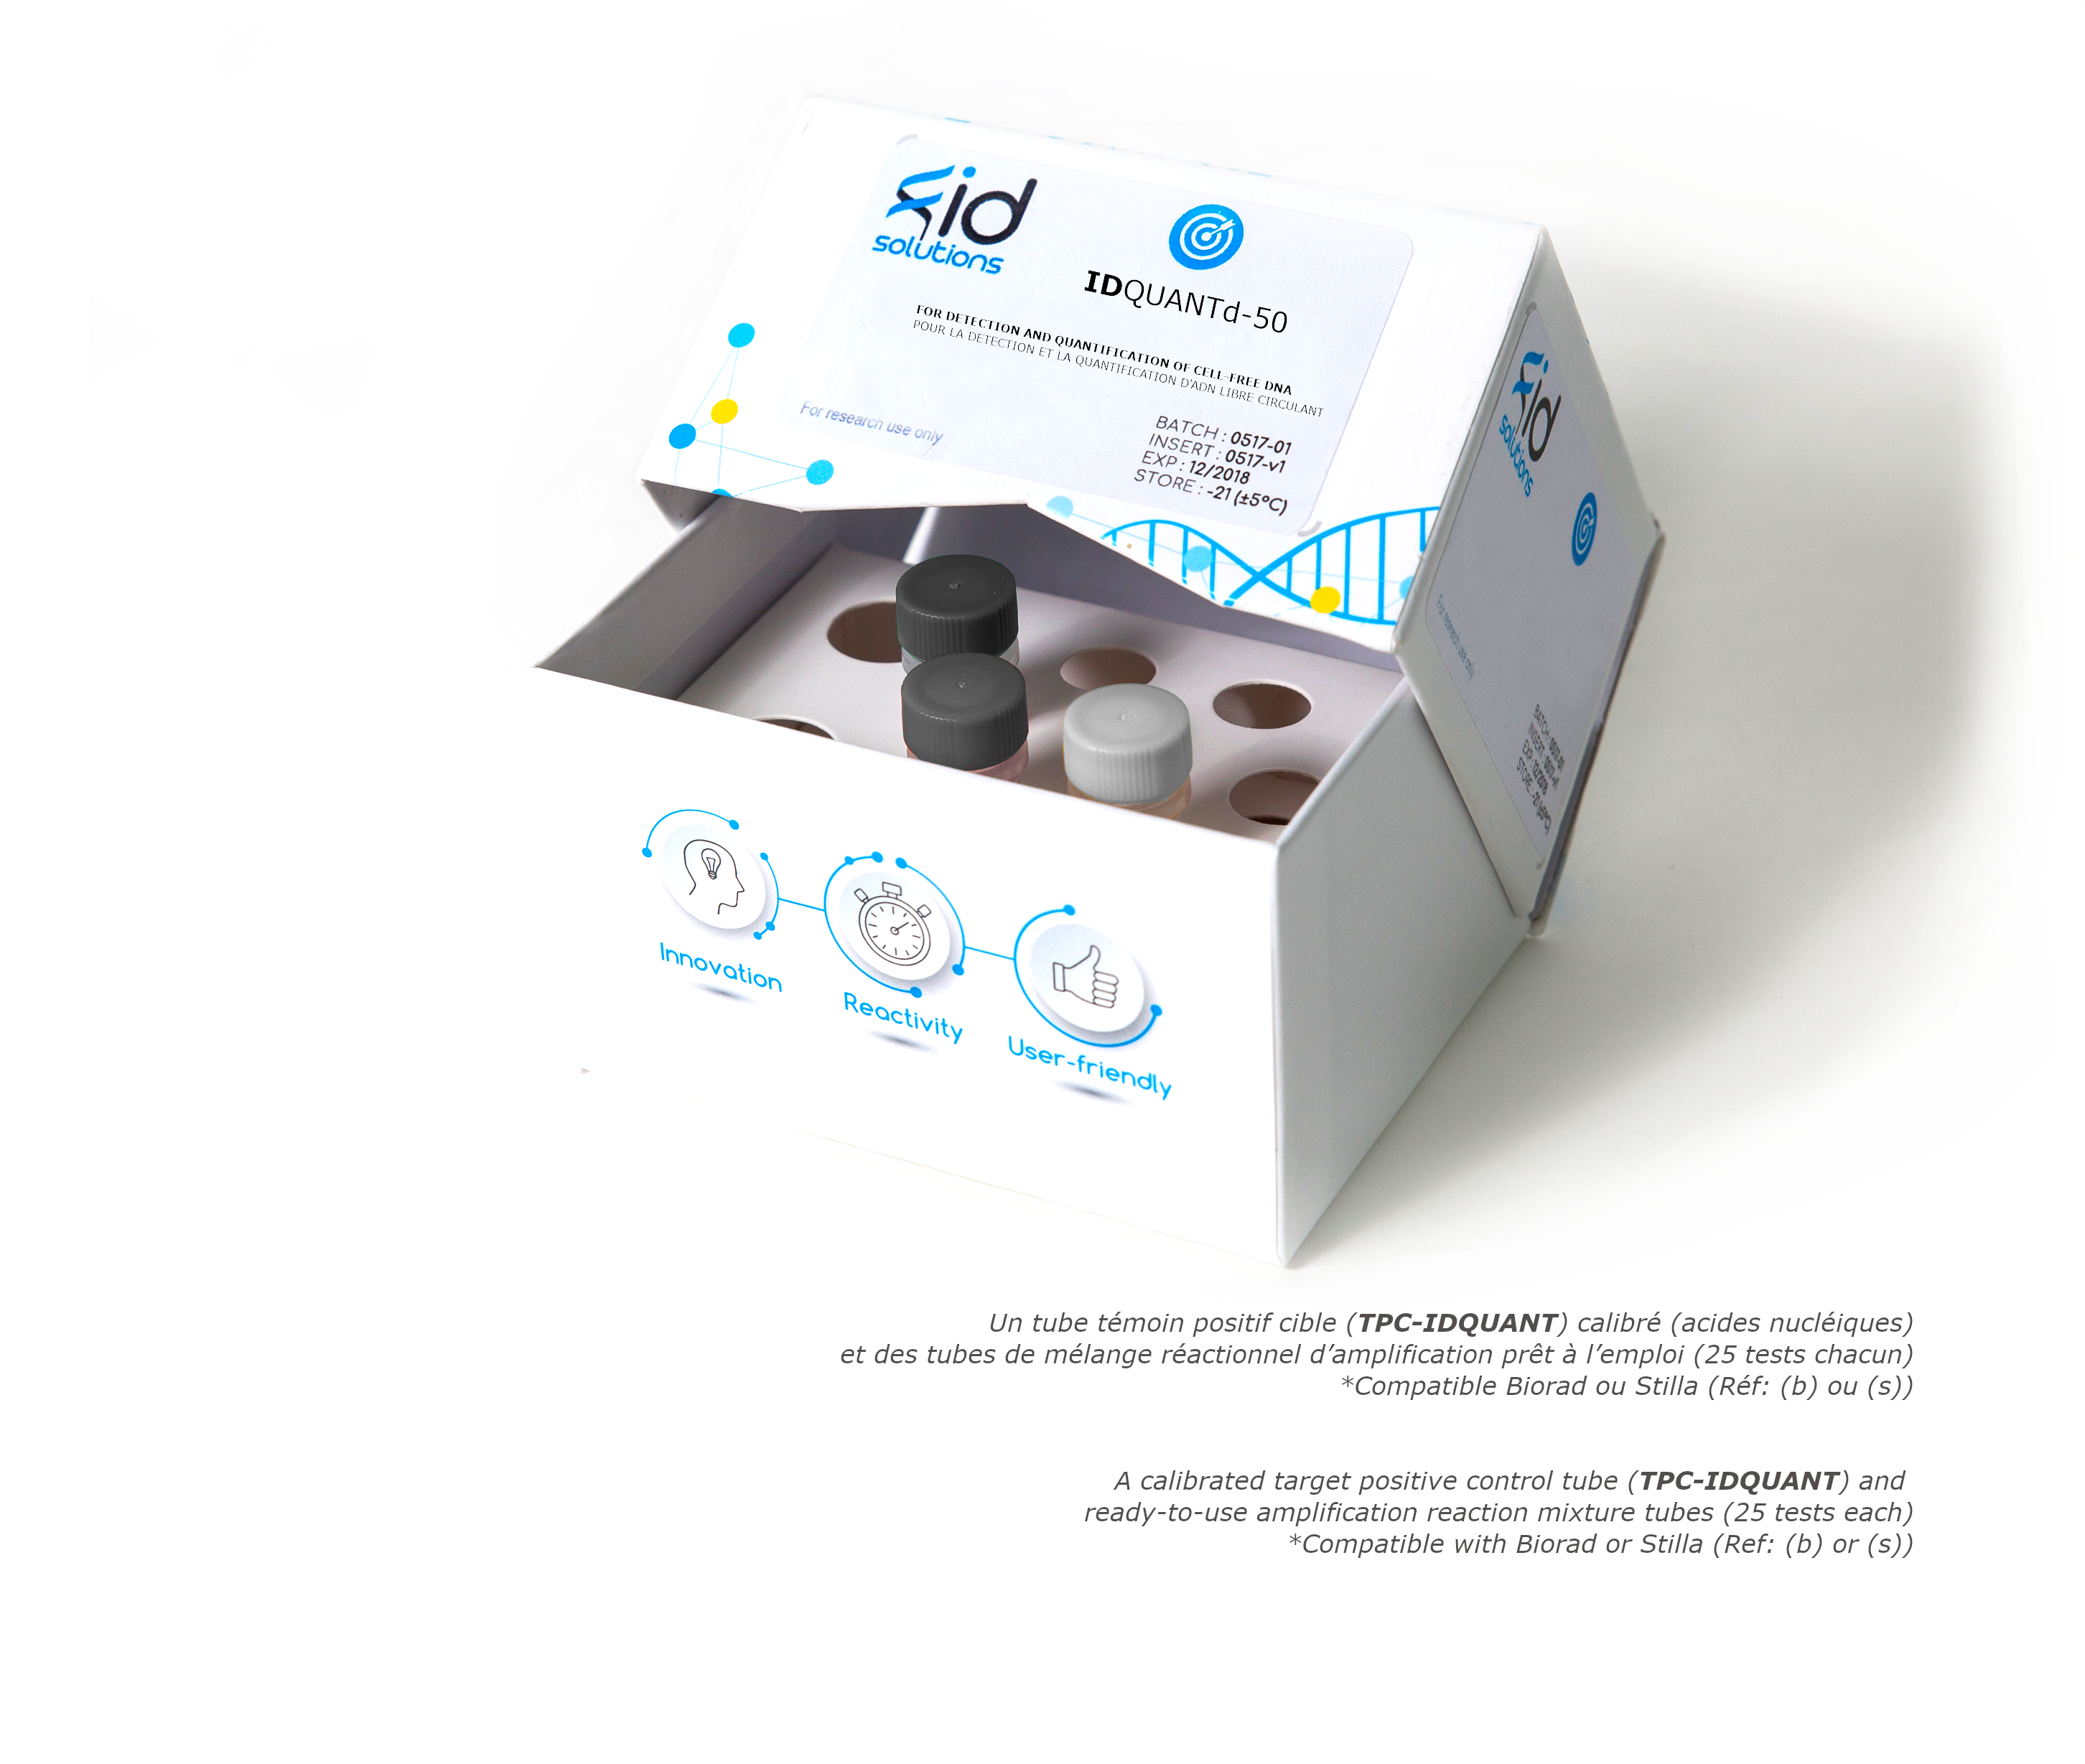 IDQUANTd - cfDNA - detection and quantification Kit using digital PCR